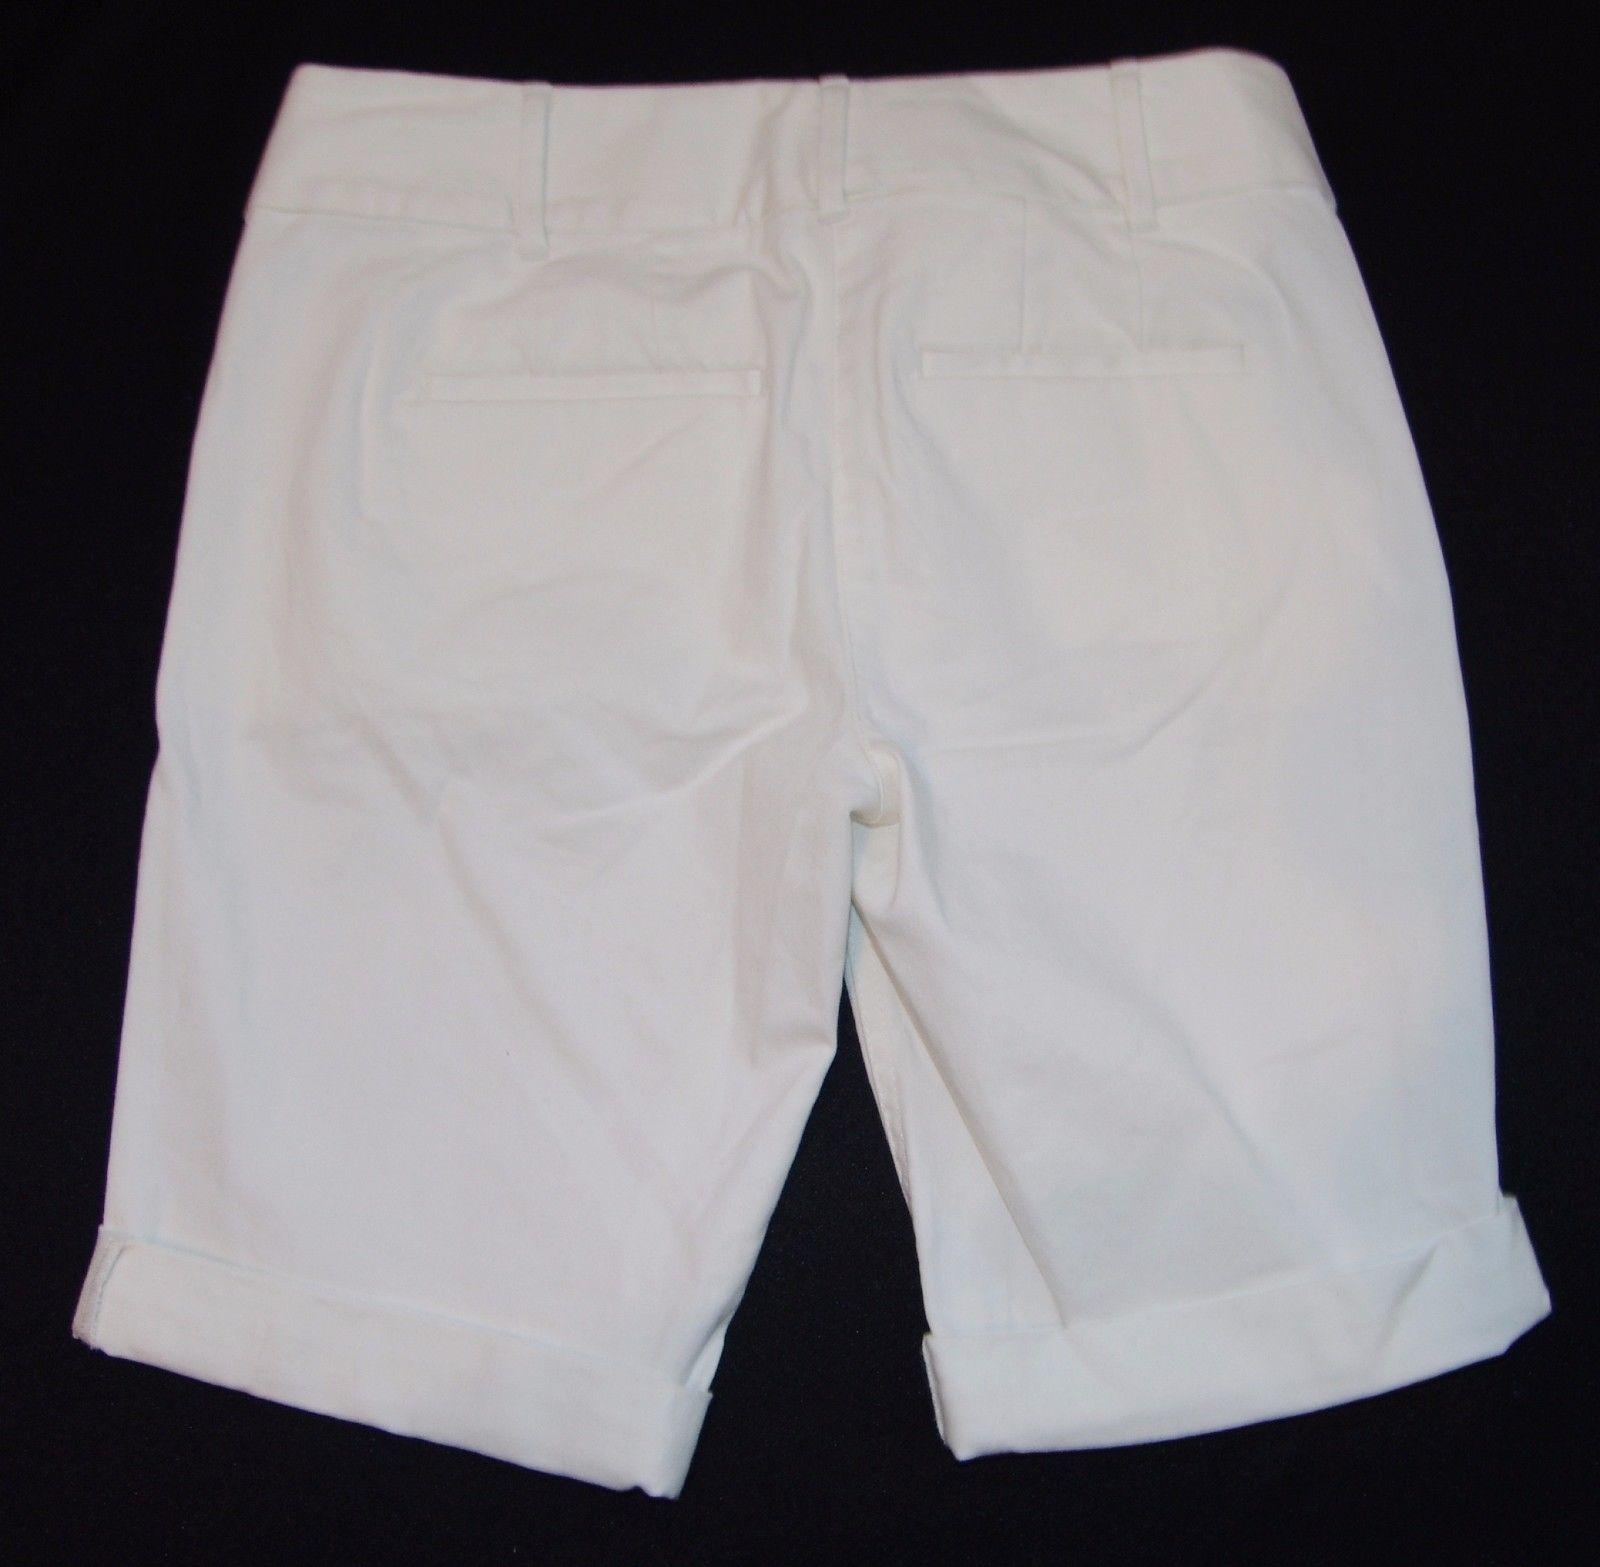 Ann Taylor Loft Nuevo con Etiquetas Pantalón Corto Talla 0 XS Blanco Bermudas